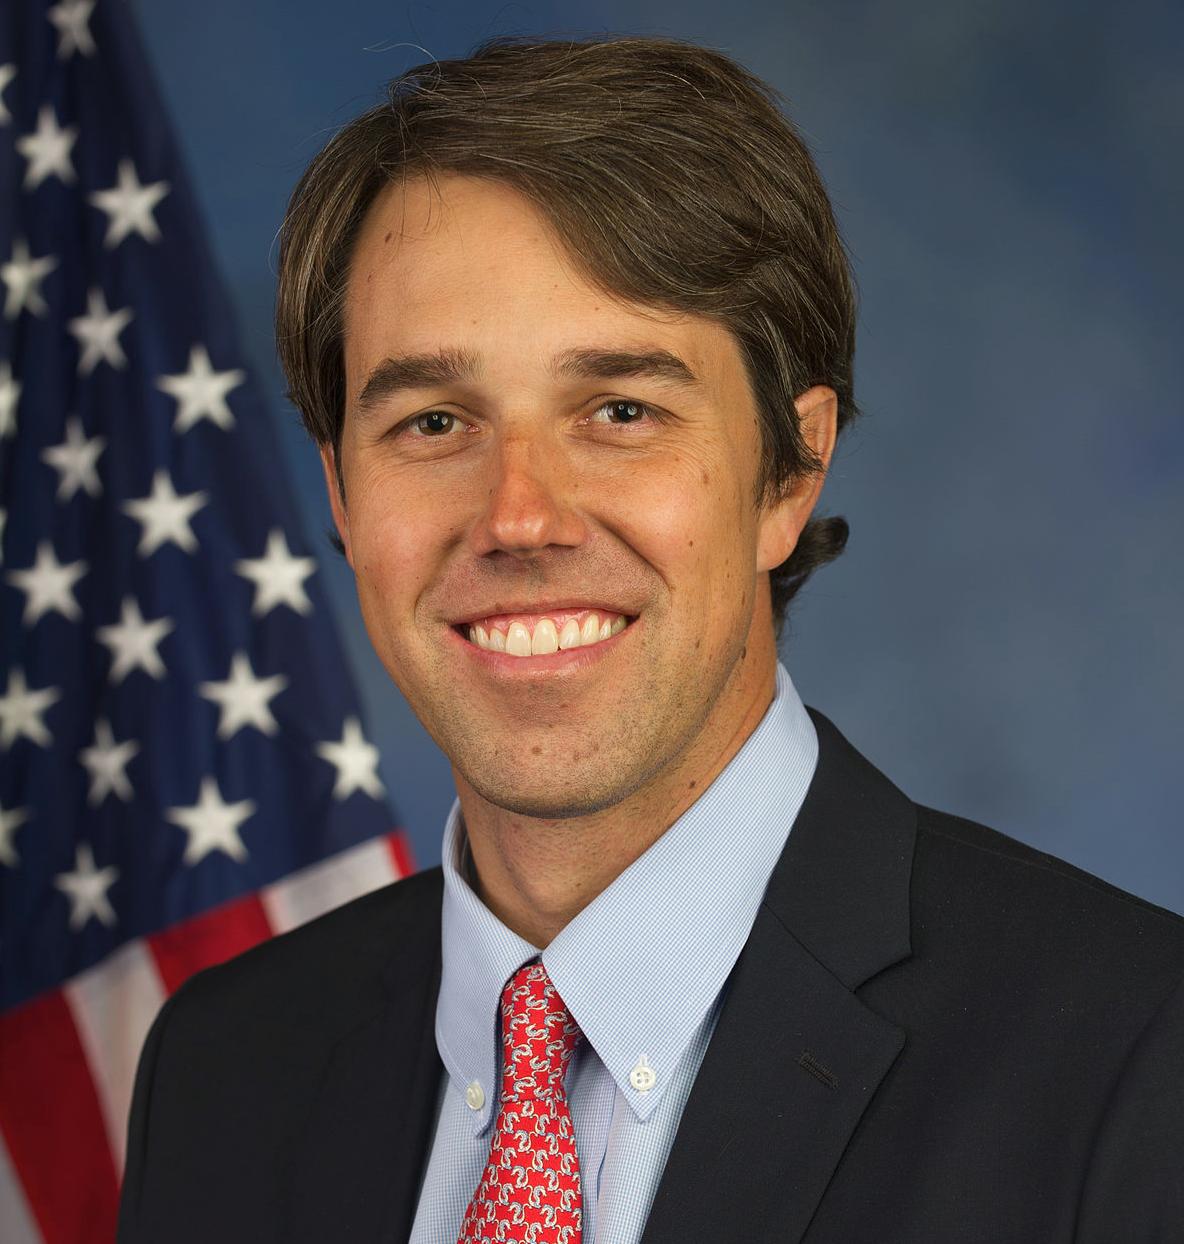 O'Rourke/Photo by U.S. House of Representatives